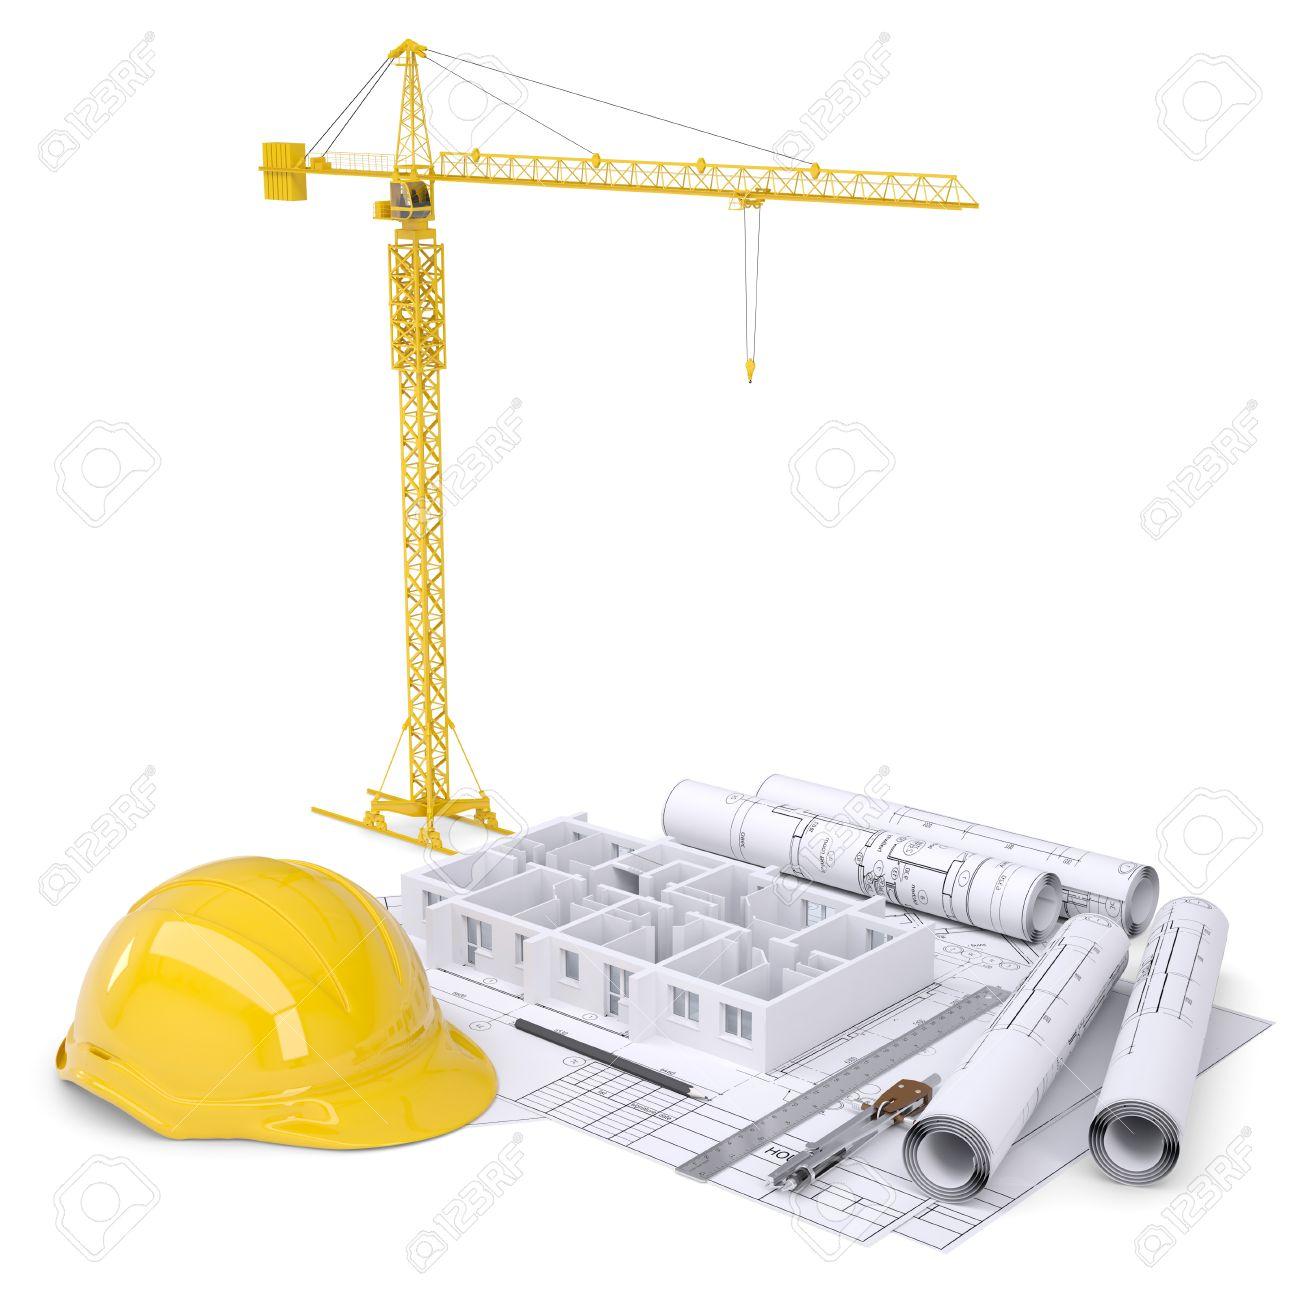 1300x1300 Apartment Block Under Construction, Crane, Blueprints, Drawing